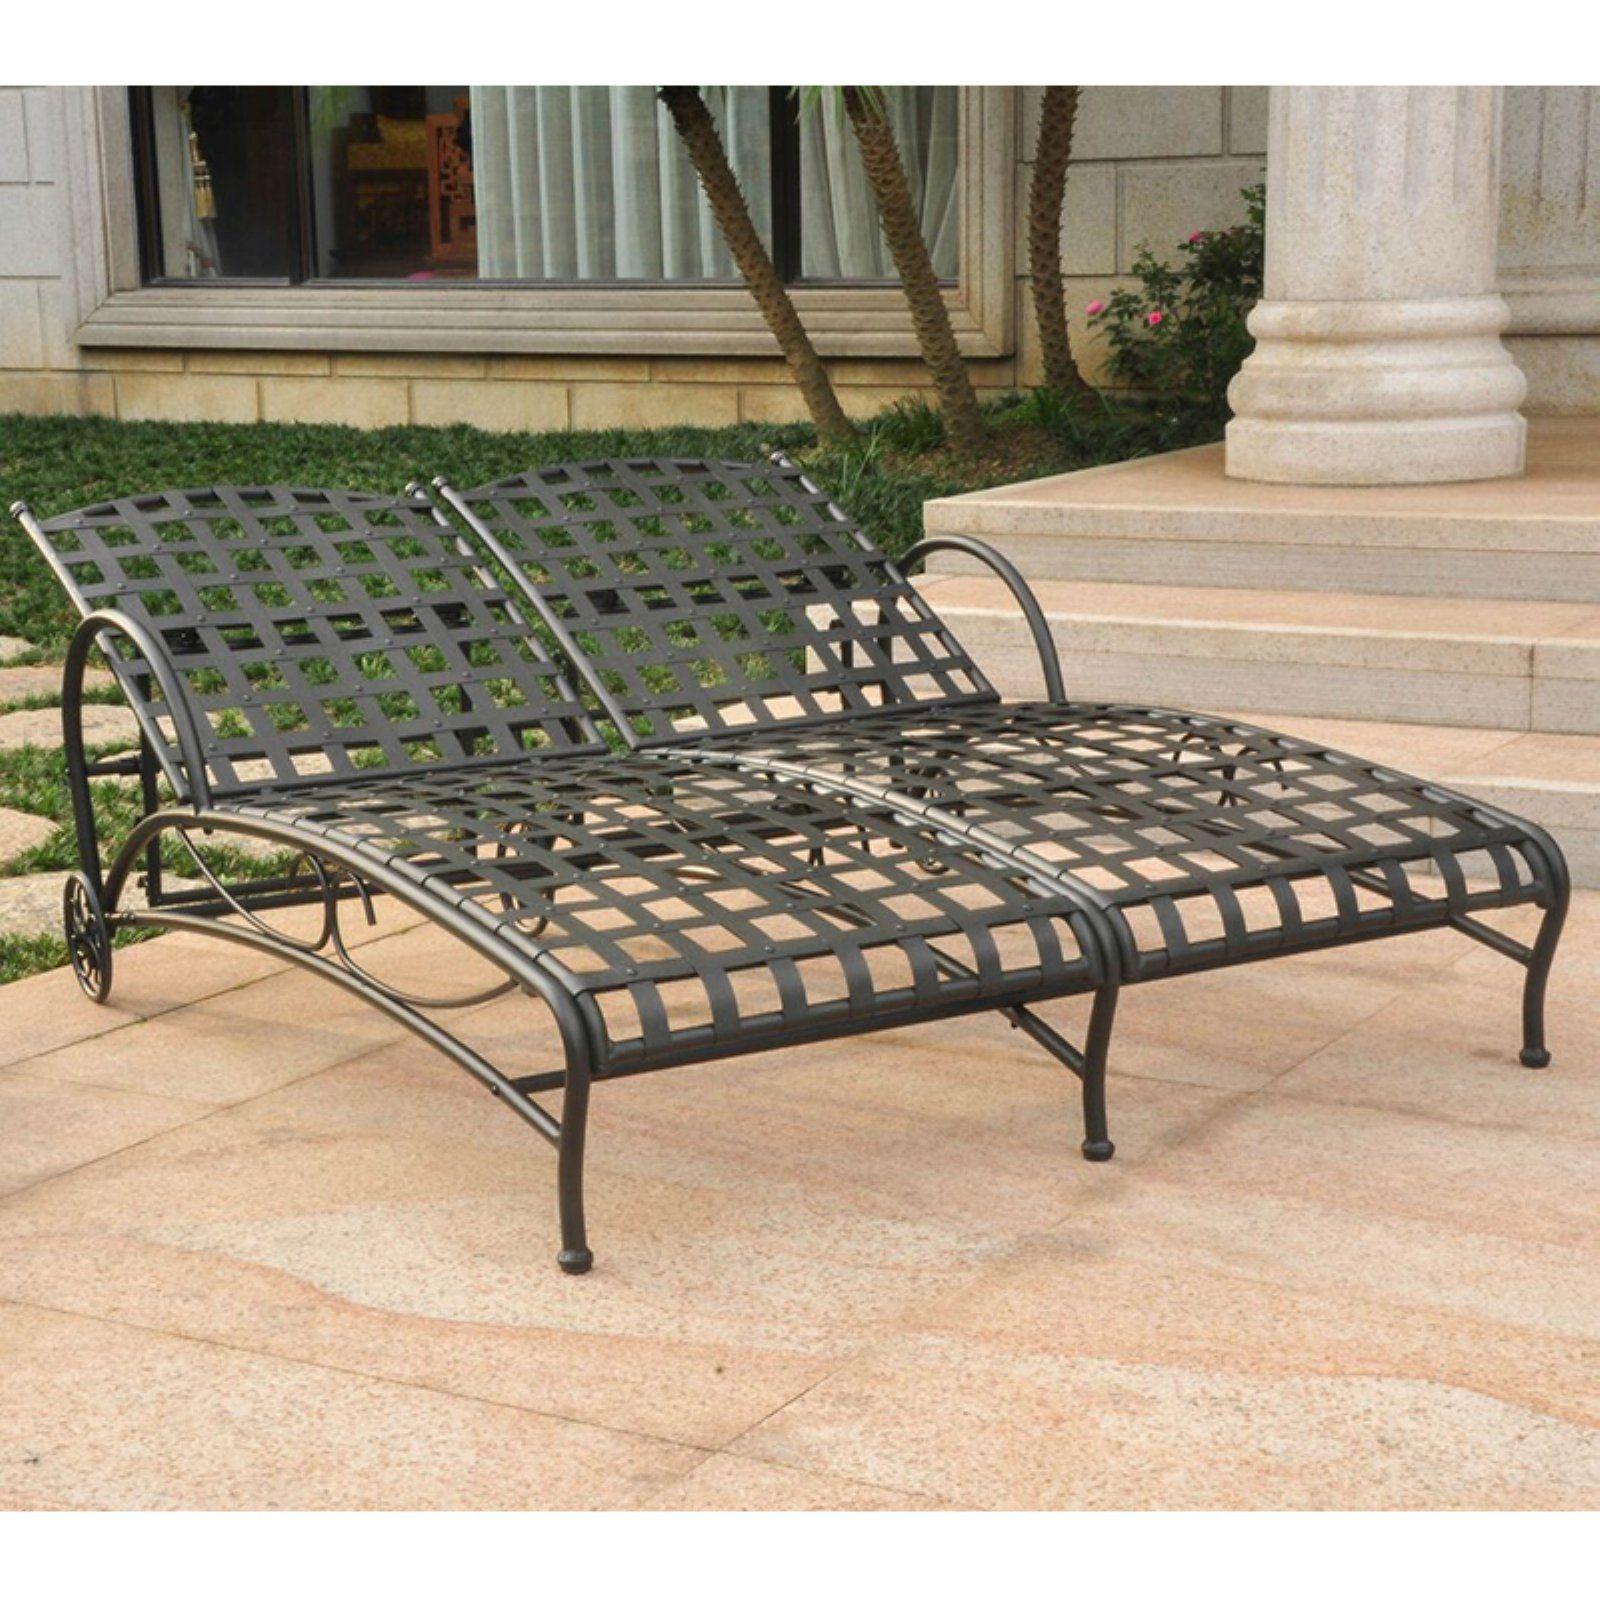 Santa Fe Nailhead Iron Multi-position Chaise Lounge